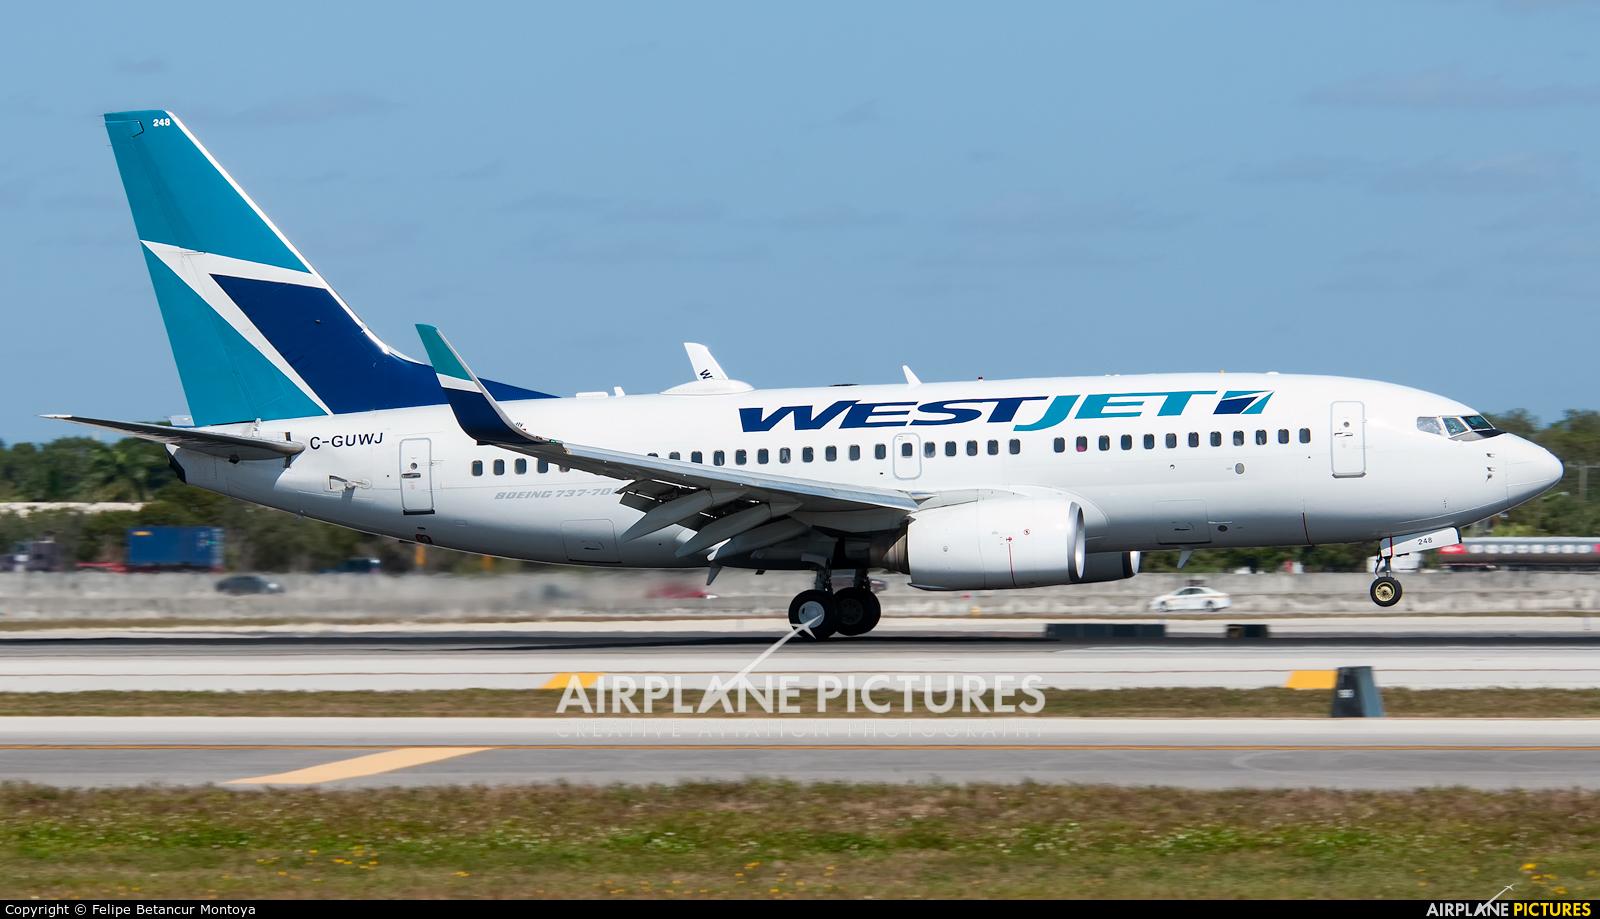 WestJet Airlines C-GUWJ aircraft at Fort Lauderdale - Hollywood Intl